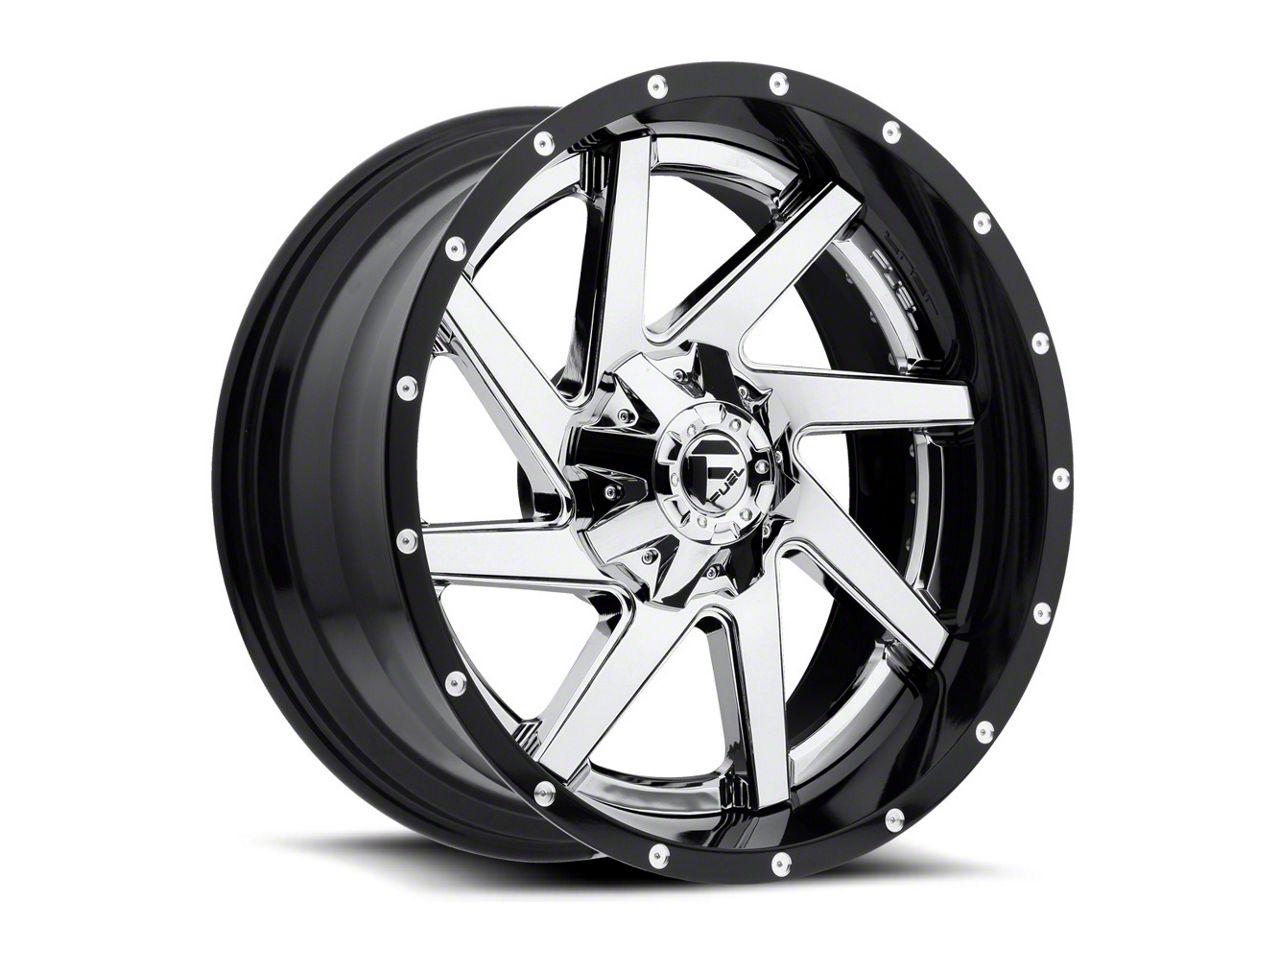 Fuel Wheels Renegade Chrome 5-Lug Wheel - 20x12 (02-18 RAM 1500, Excluding Mega Cab)